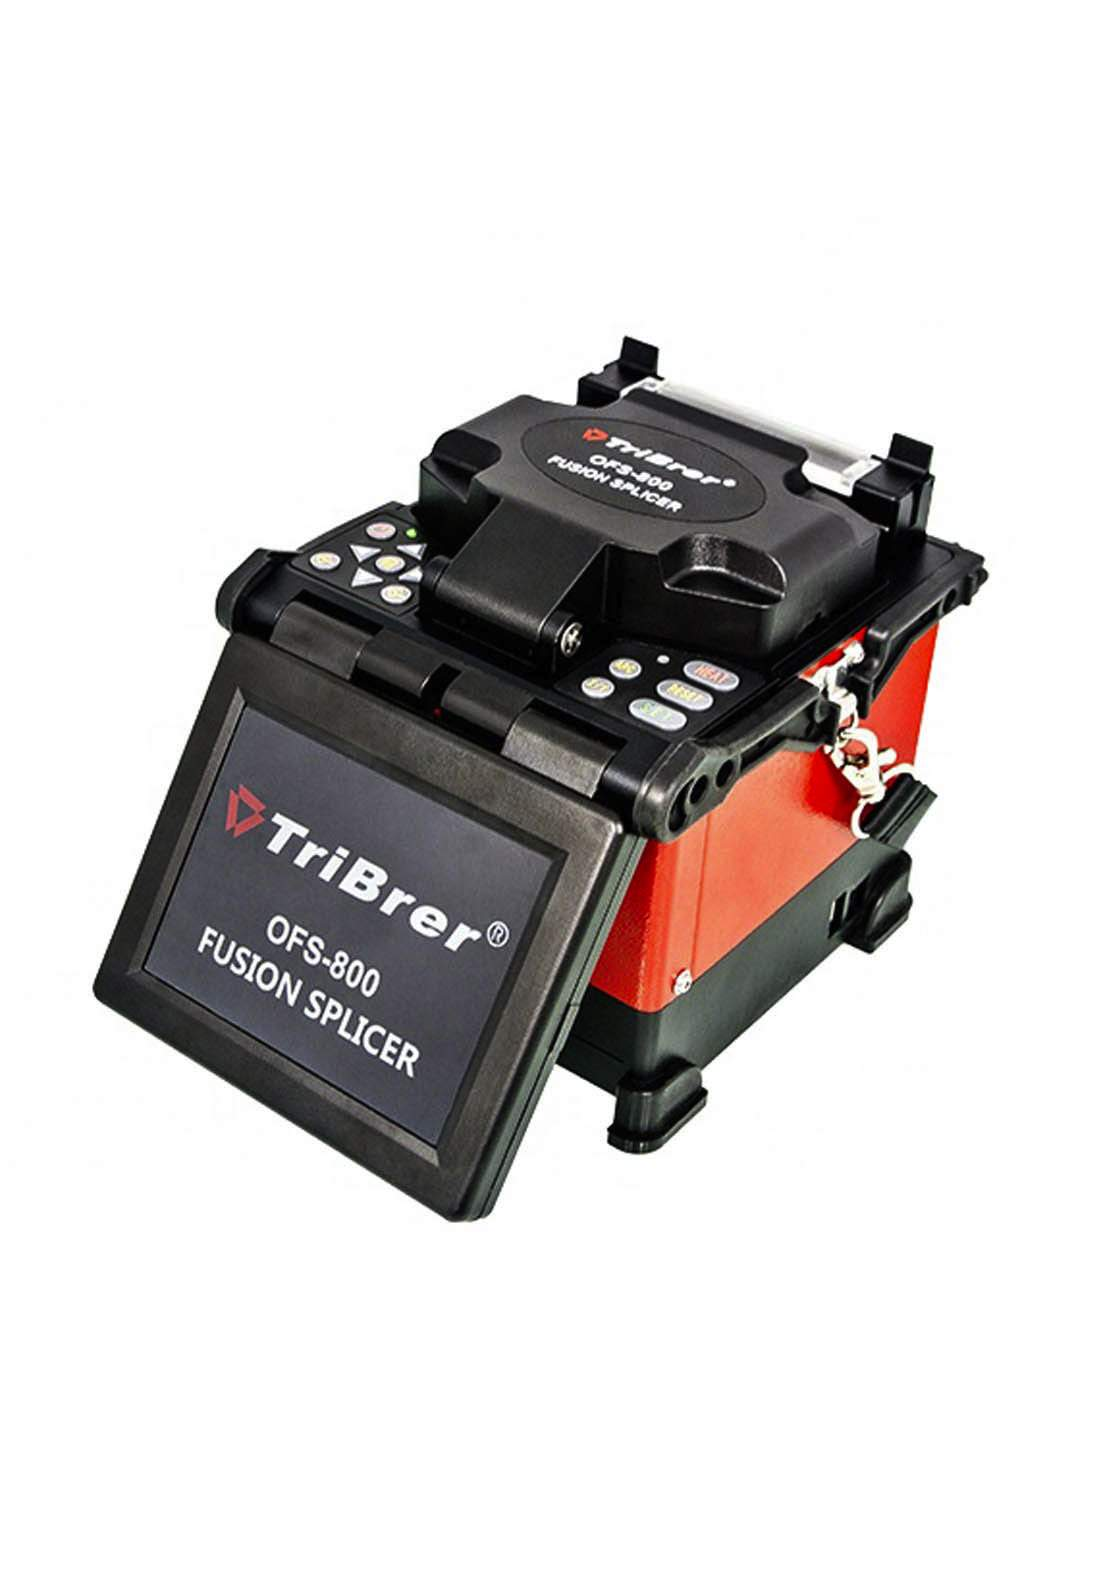 TriBrer OFS-800 Single Fiber Fusion Splicer ماكنة لحام الألياف الضوئية